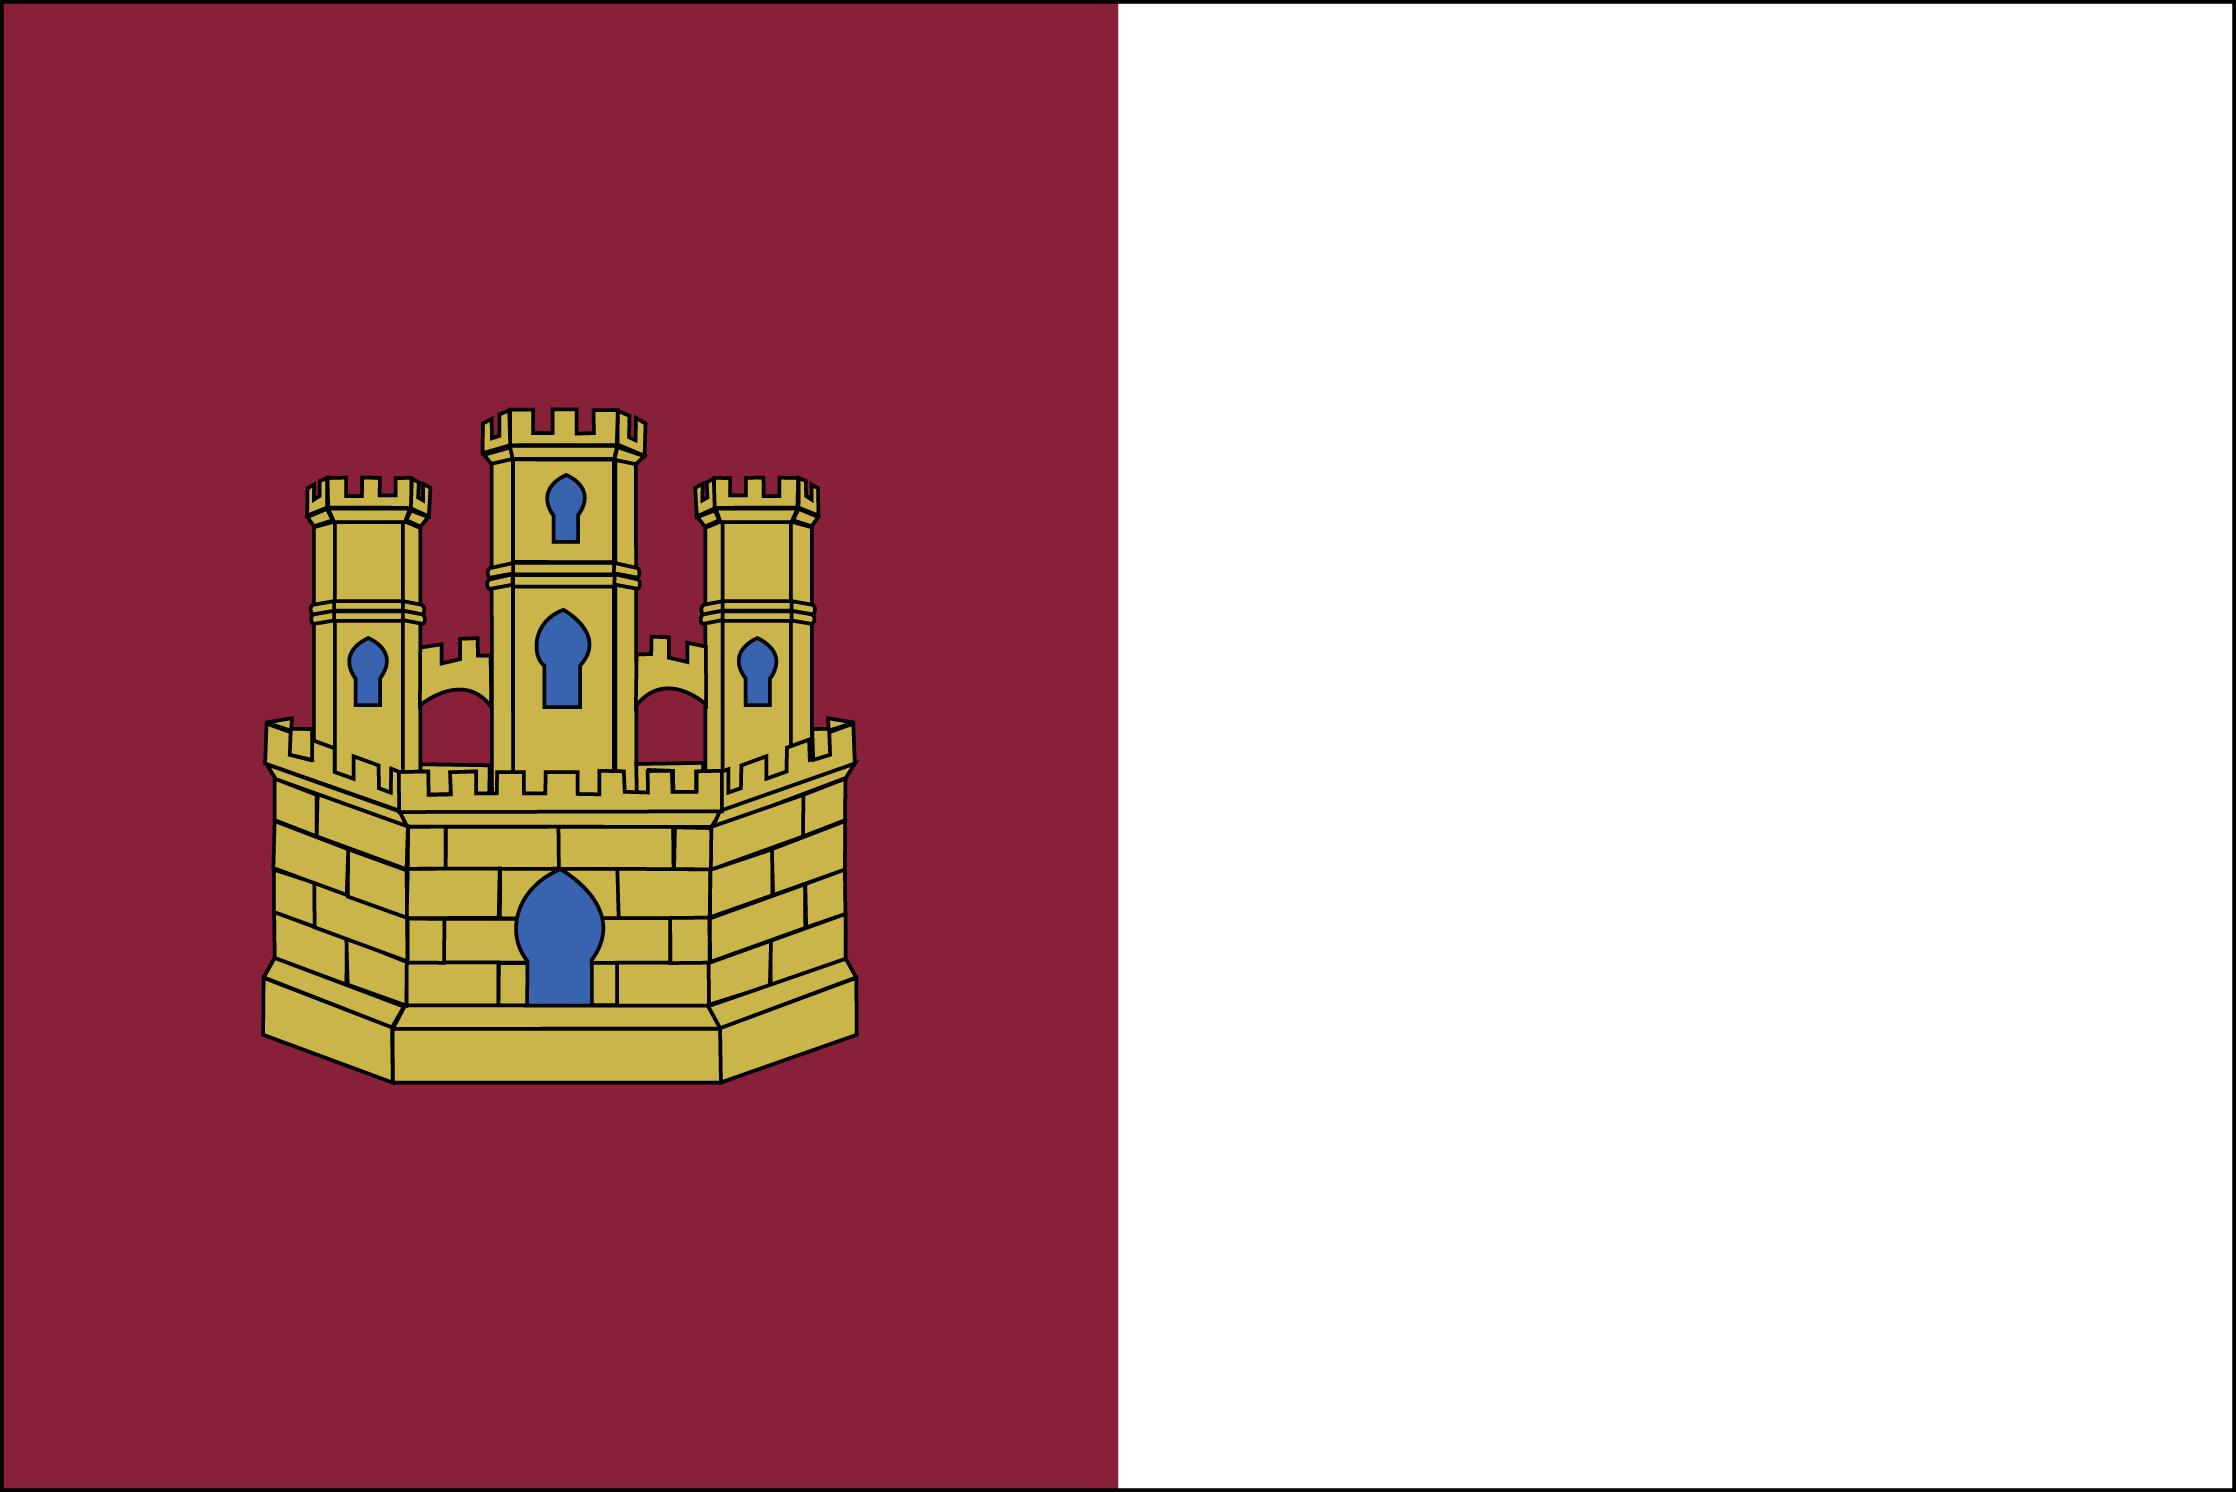 Convocatoria exámen de consejero de seguridad: Castilla La Mancha 2013